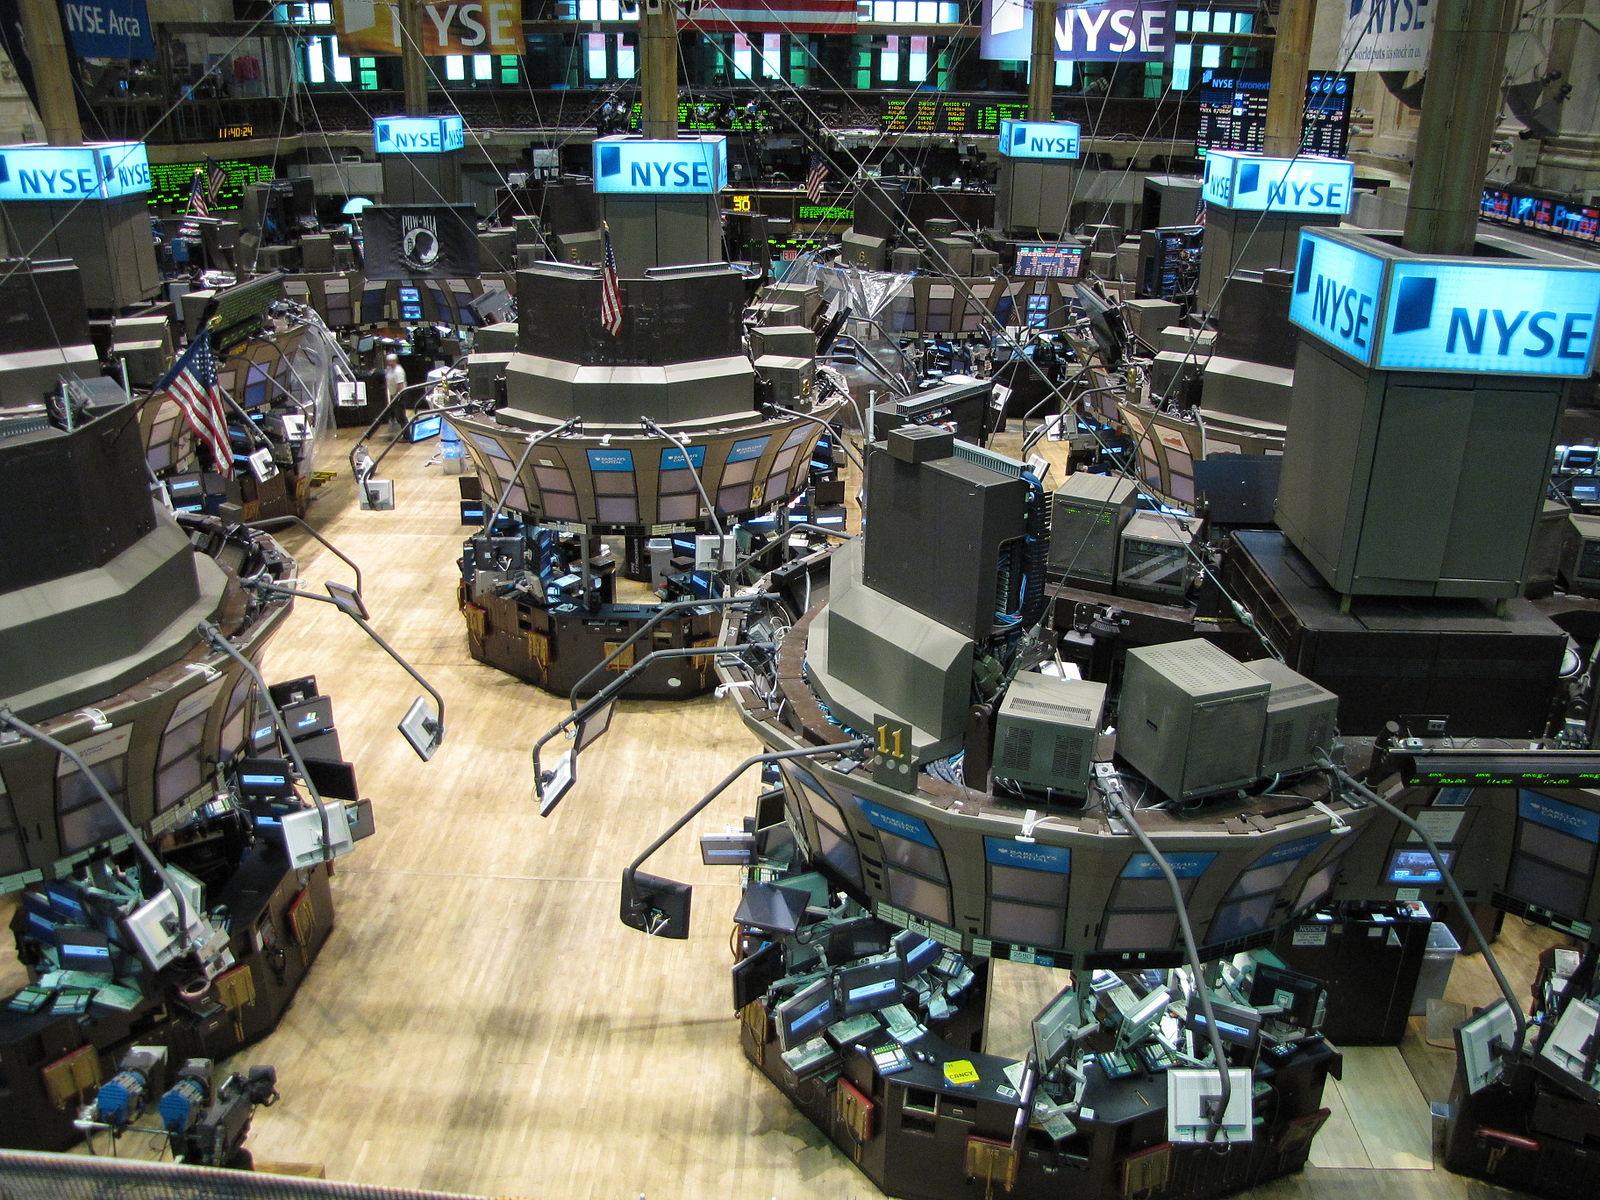 A photo of the empty floor of the New York Stock Exchange